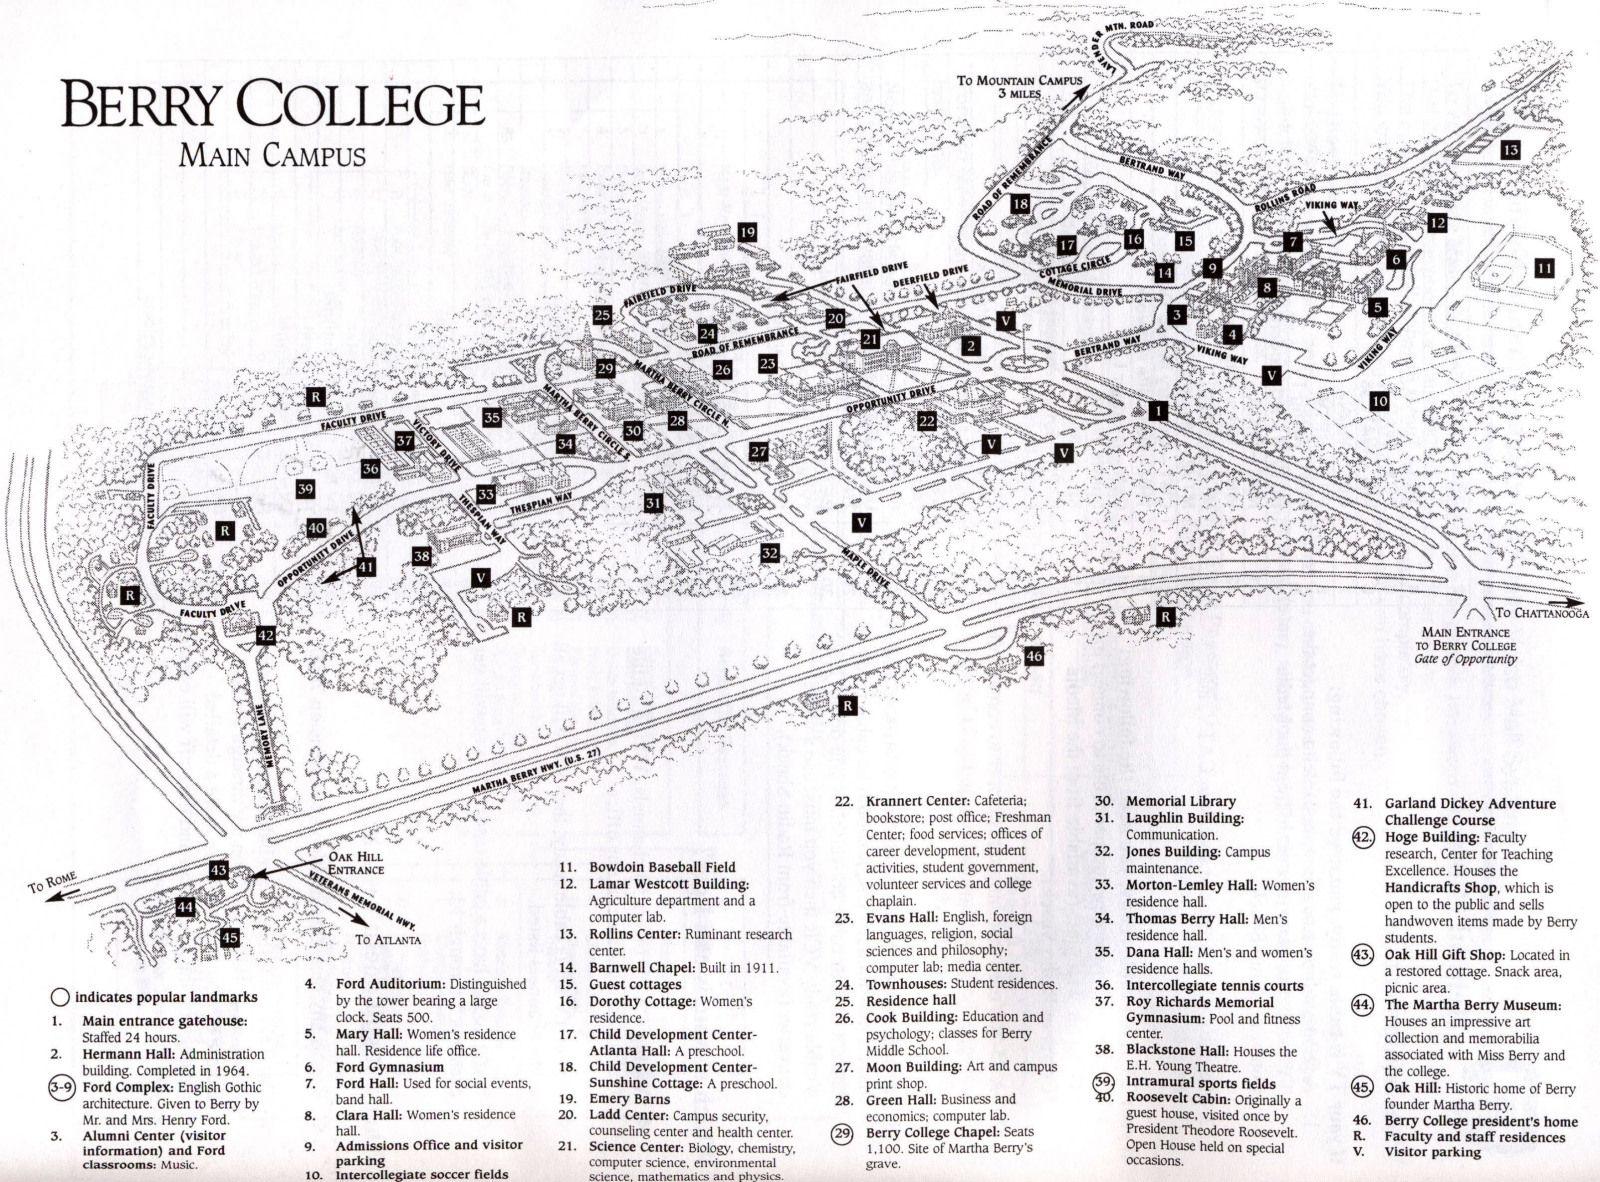 Berry College Campus Map Campus map (Main Campus), Berry College | The Academy | Campus map